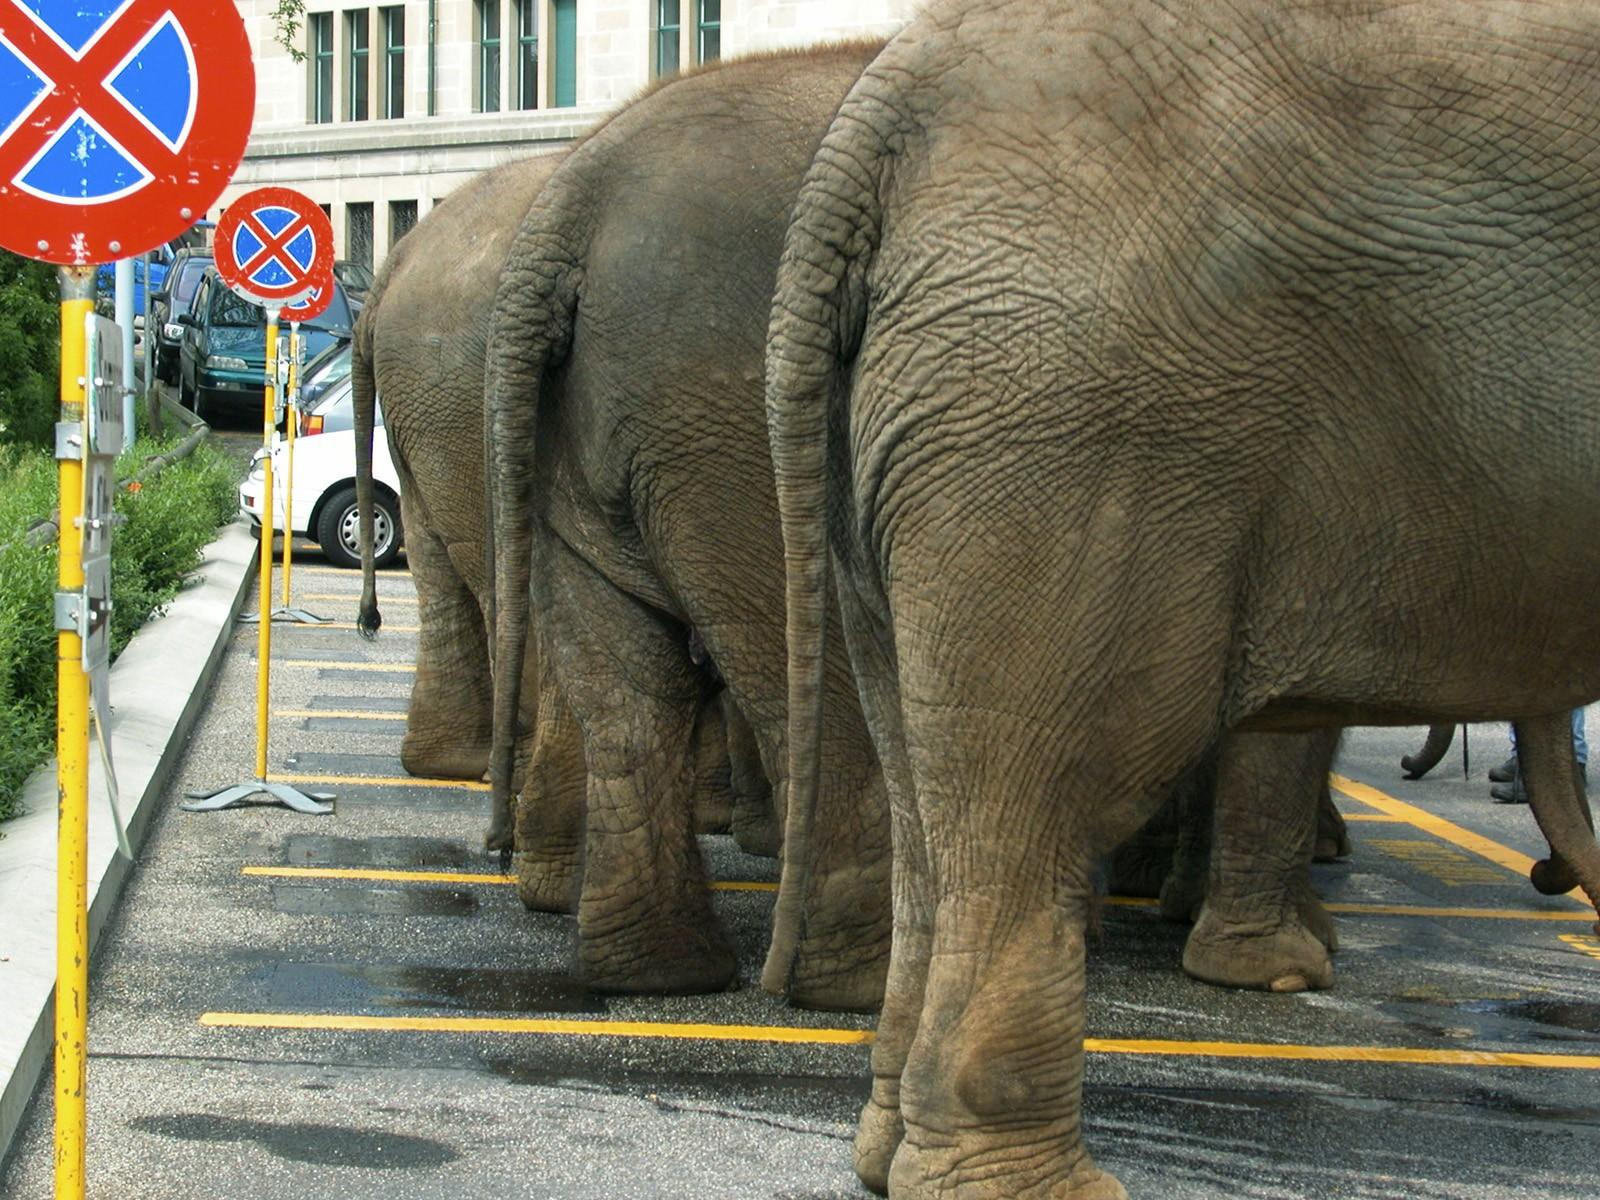 C:\Documents and Settings\Пользователь\Рабочий стол\ЗАКОНОДАВСТВО\Animals___Elephants_Elephants_in_the_Parking_lot_081675_.jpg